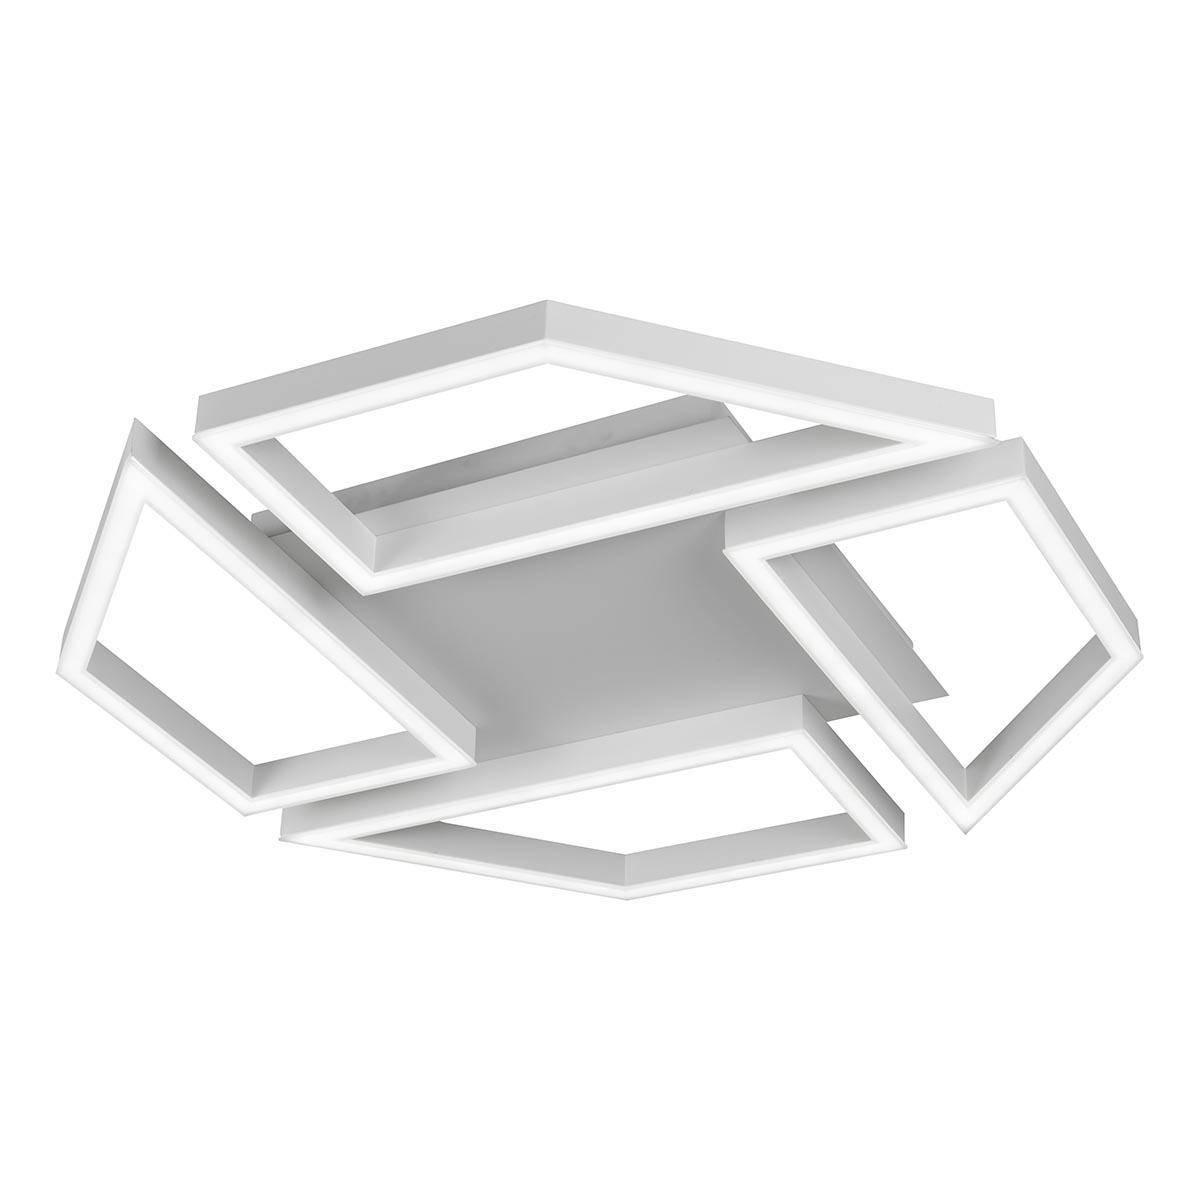 Потолочная светодиодная люстра iLedex Stellar 8302-720X720-X-T WH